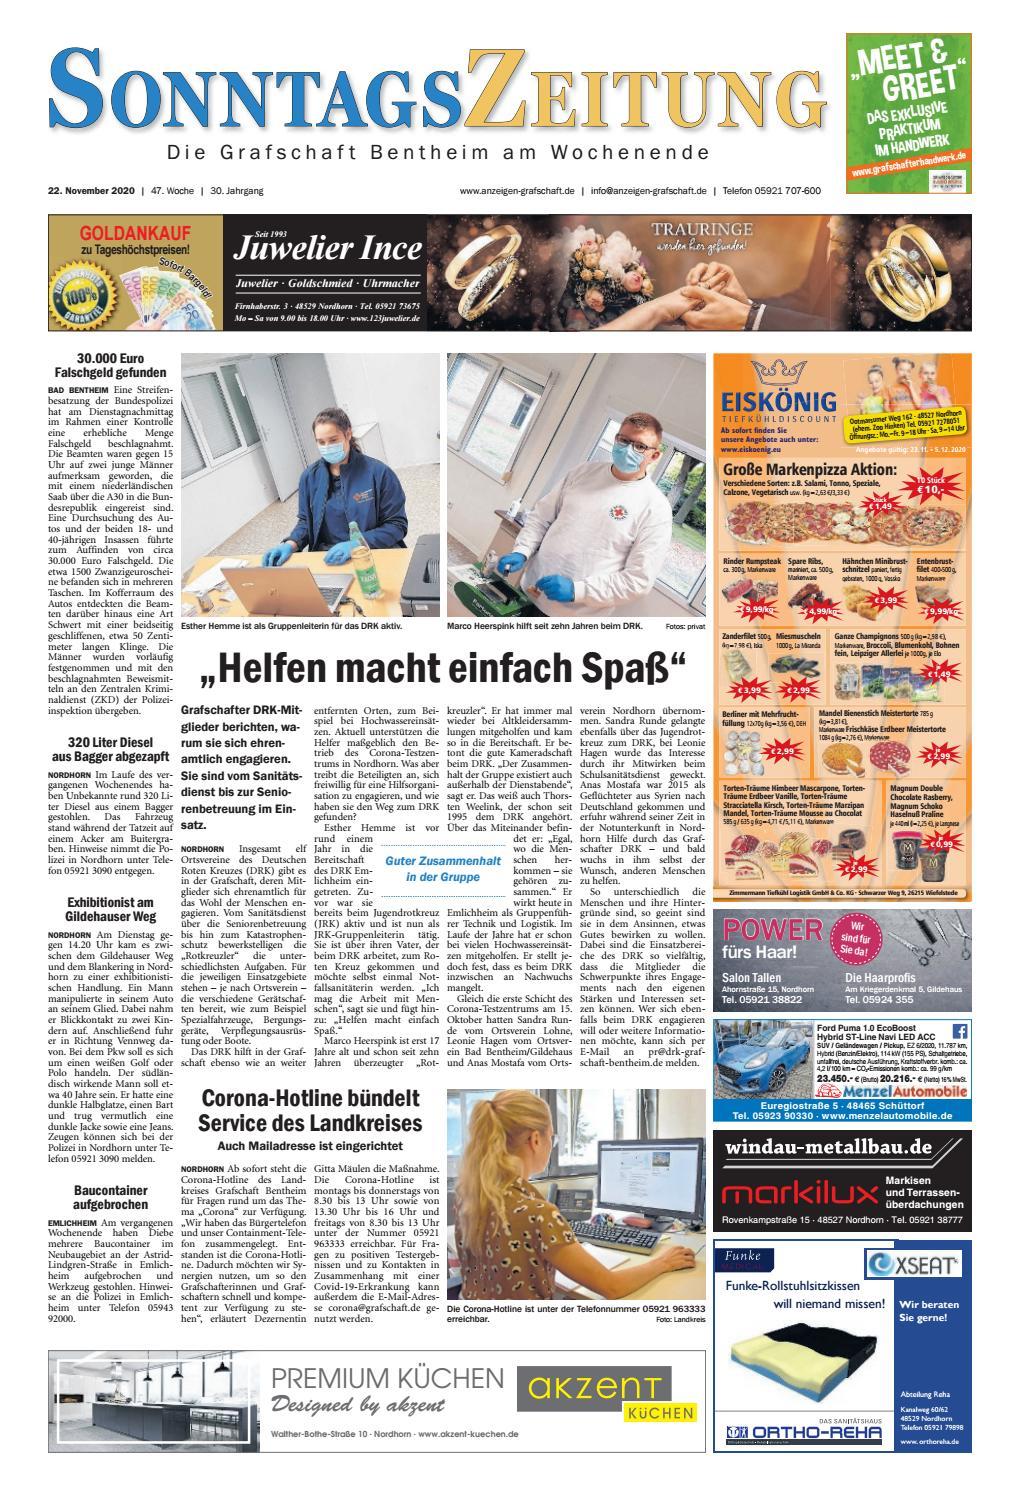 sonntagszeitung 2020 11 22 by